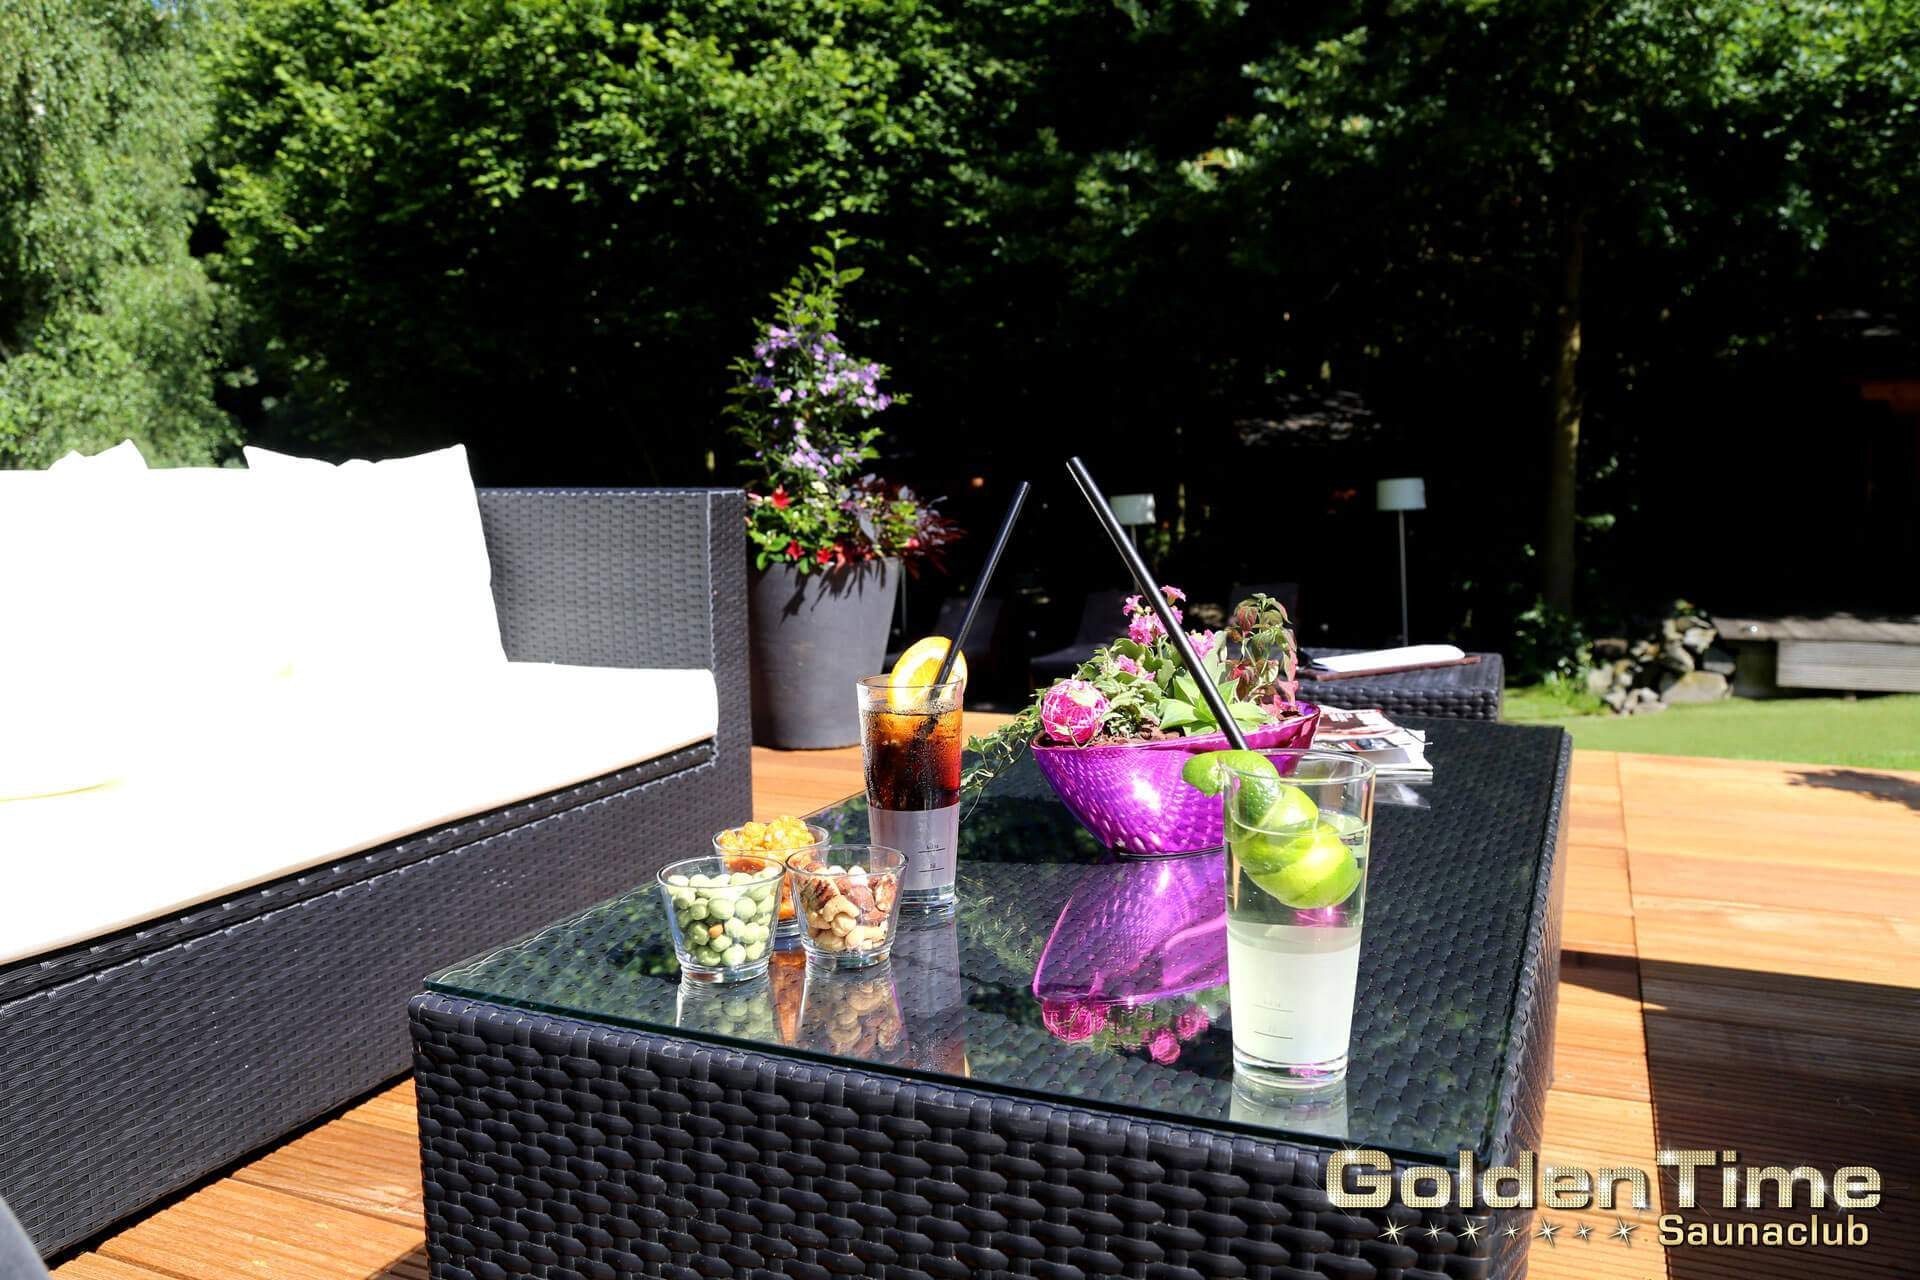 01-terrasse-pic-08-goldentime-saunaclub.jpg